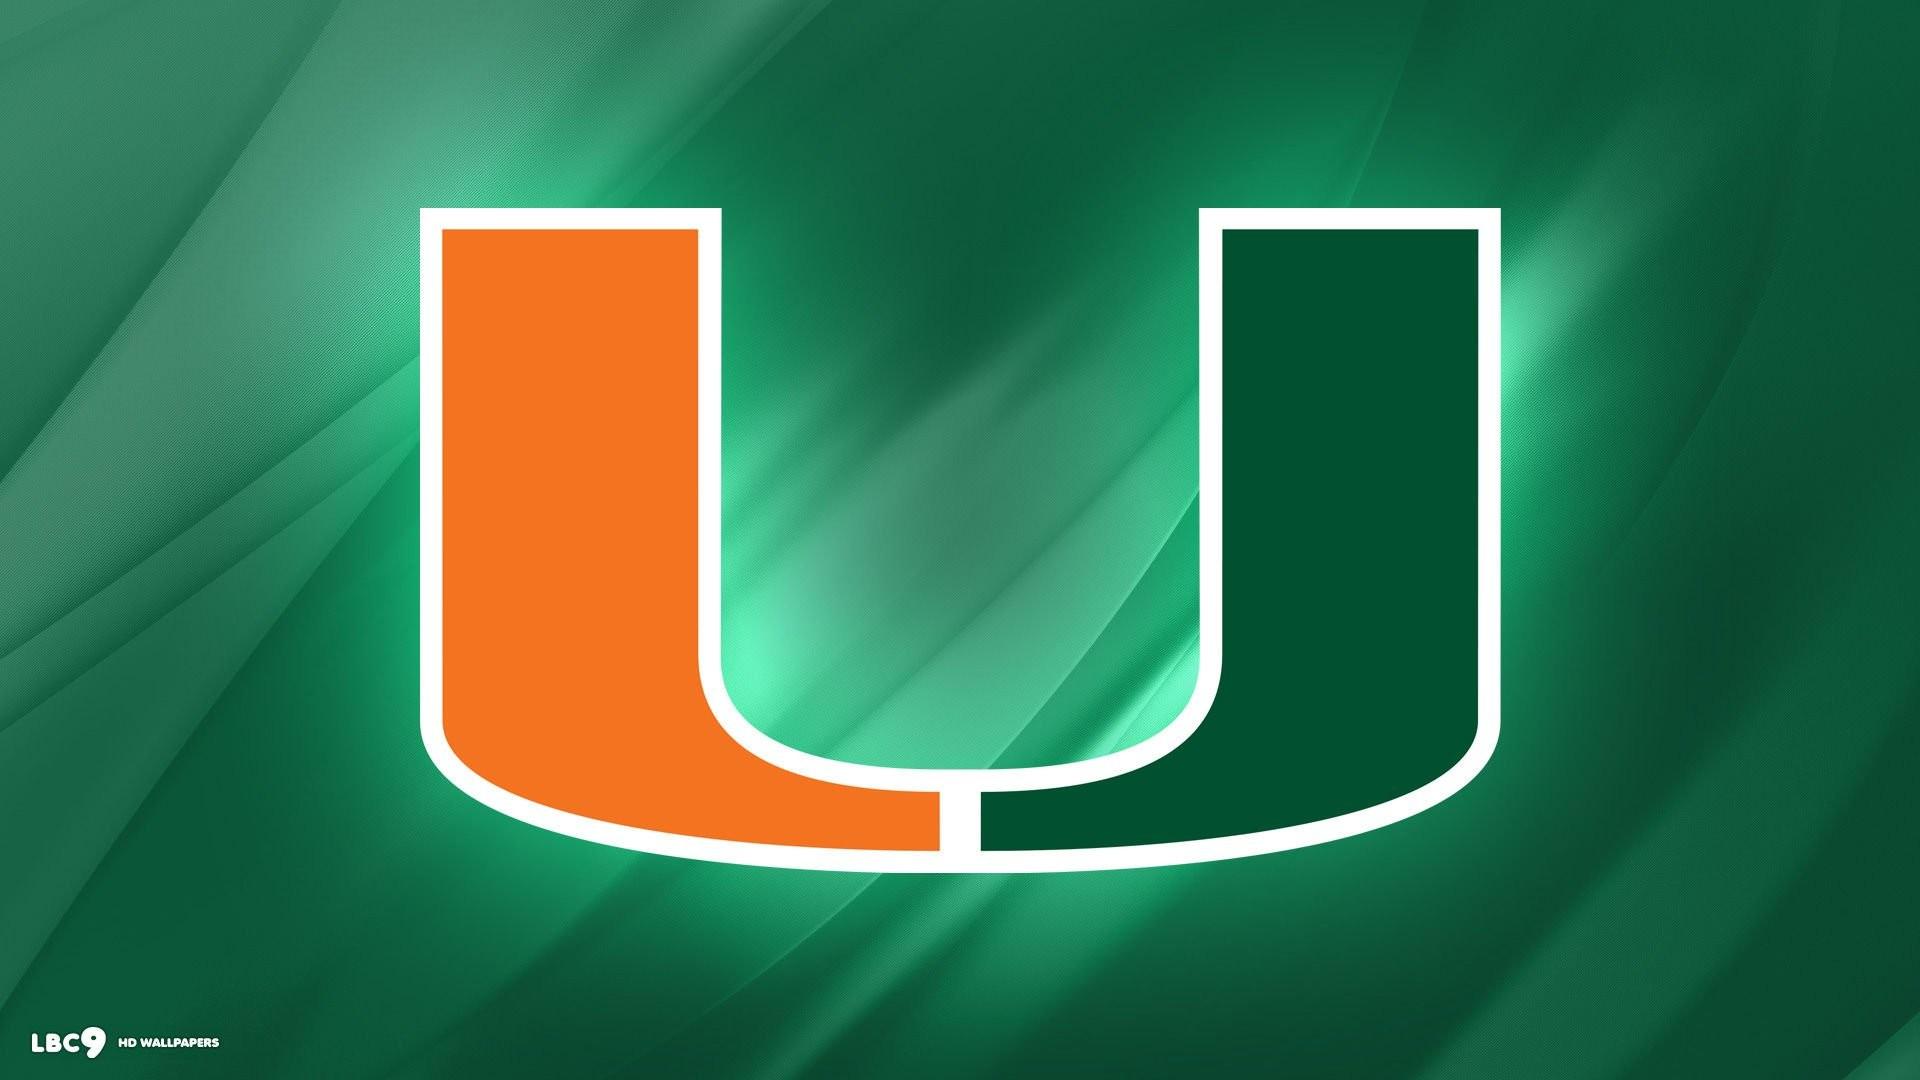 Miami Hurricanes Basketball Logo >> Arizona Wildcats Wallpapers (66+ images)